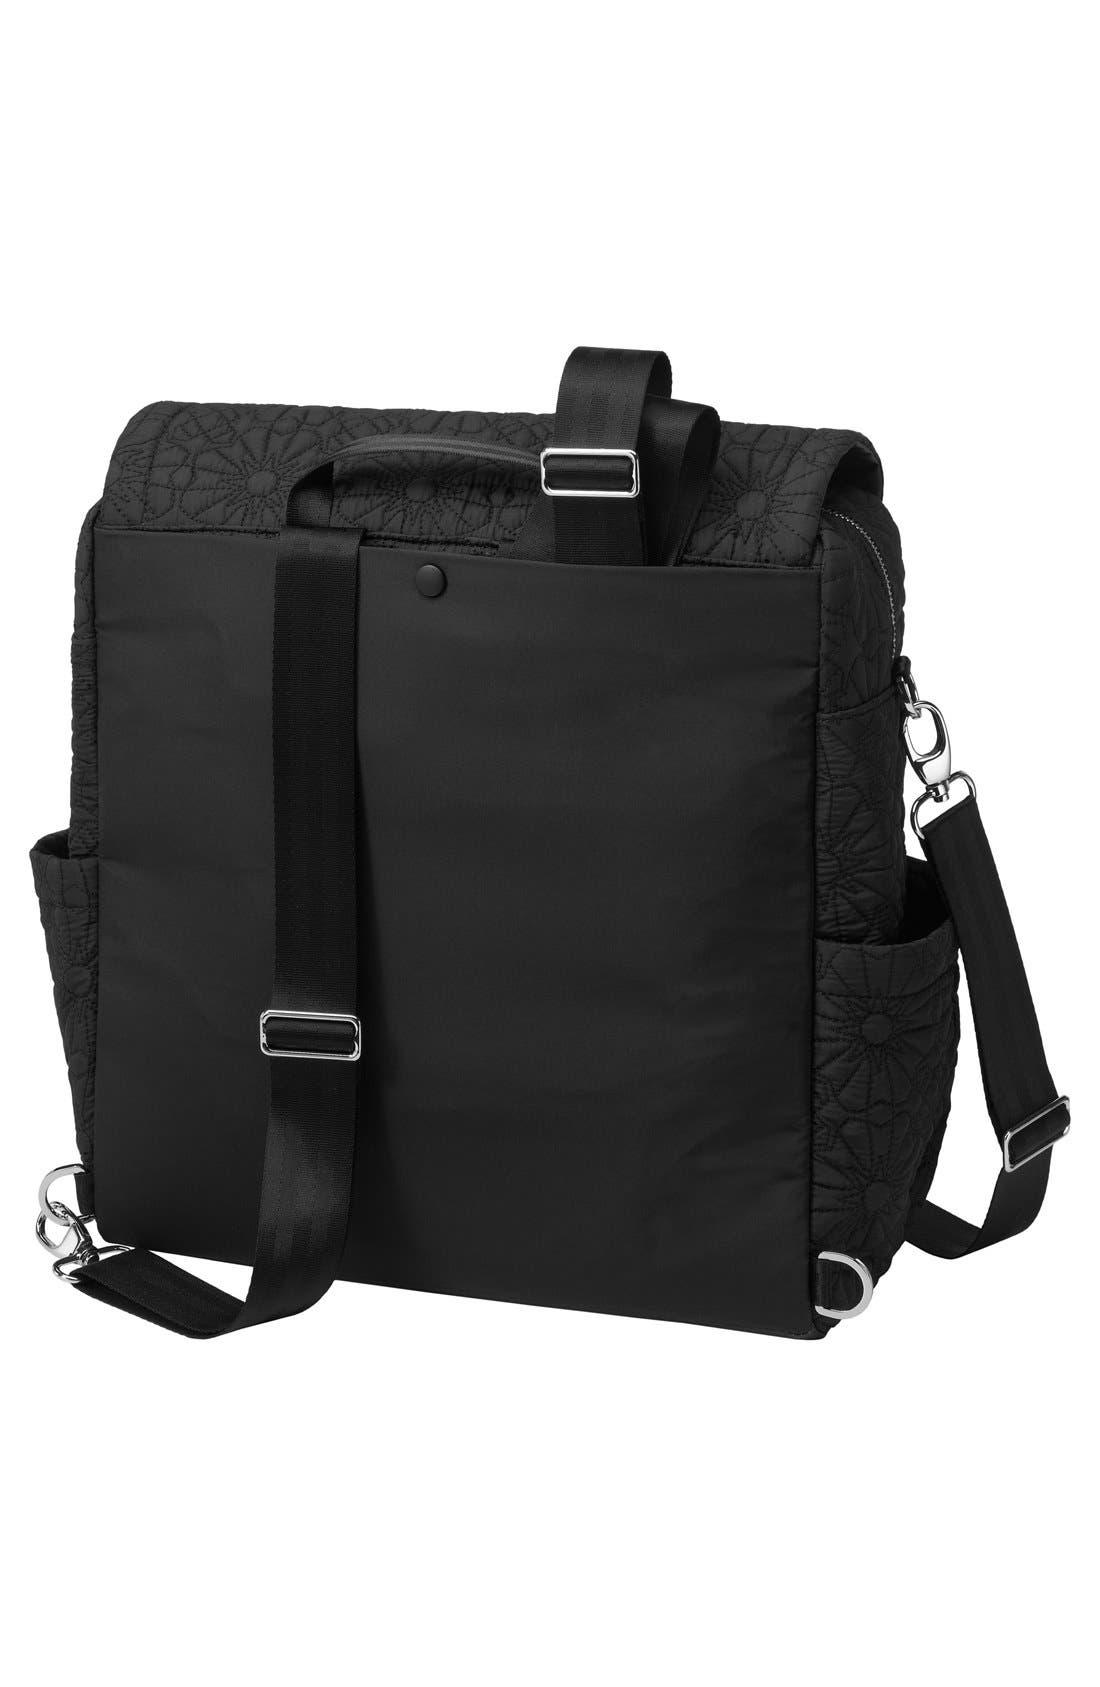 'Embossed Boxy' Backpack Diaper Bag,                             Alternate thumbnail 7, color,                             002